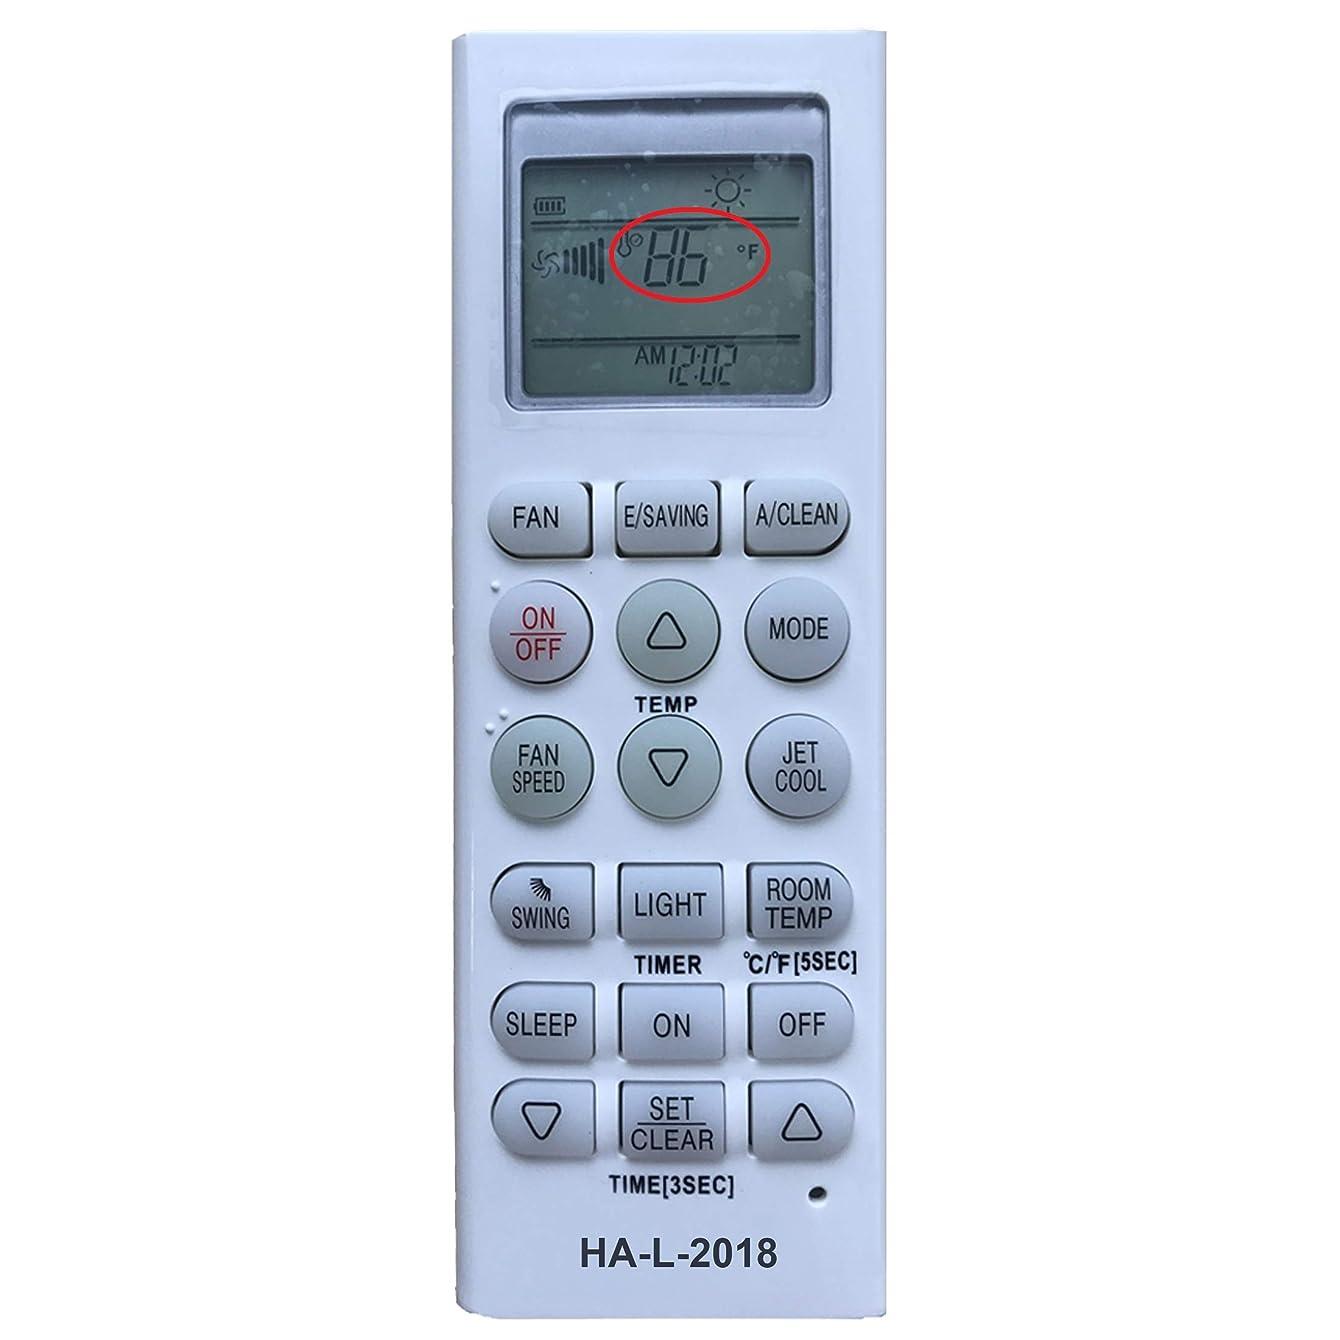 YING RAY Replacement for LG Air Conditioner Remote Control CC07AWV CC12AWV AKB73456115 AKB73756206 A12AWG LAN090HSV4 AKB73635619 D13-SBB6MN AMNW07GDBL1 AKB73215509 PQWRHQ0FDB LCN097HV4 CC18AWR